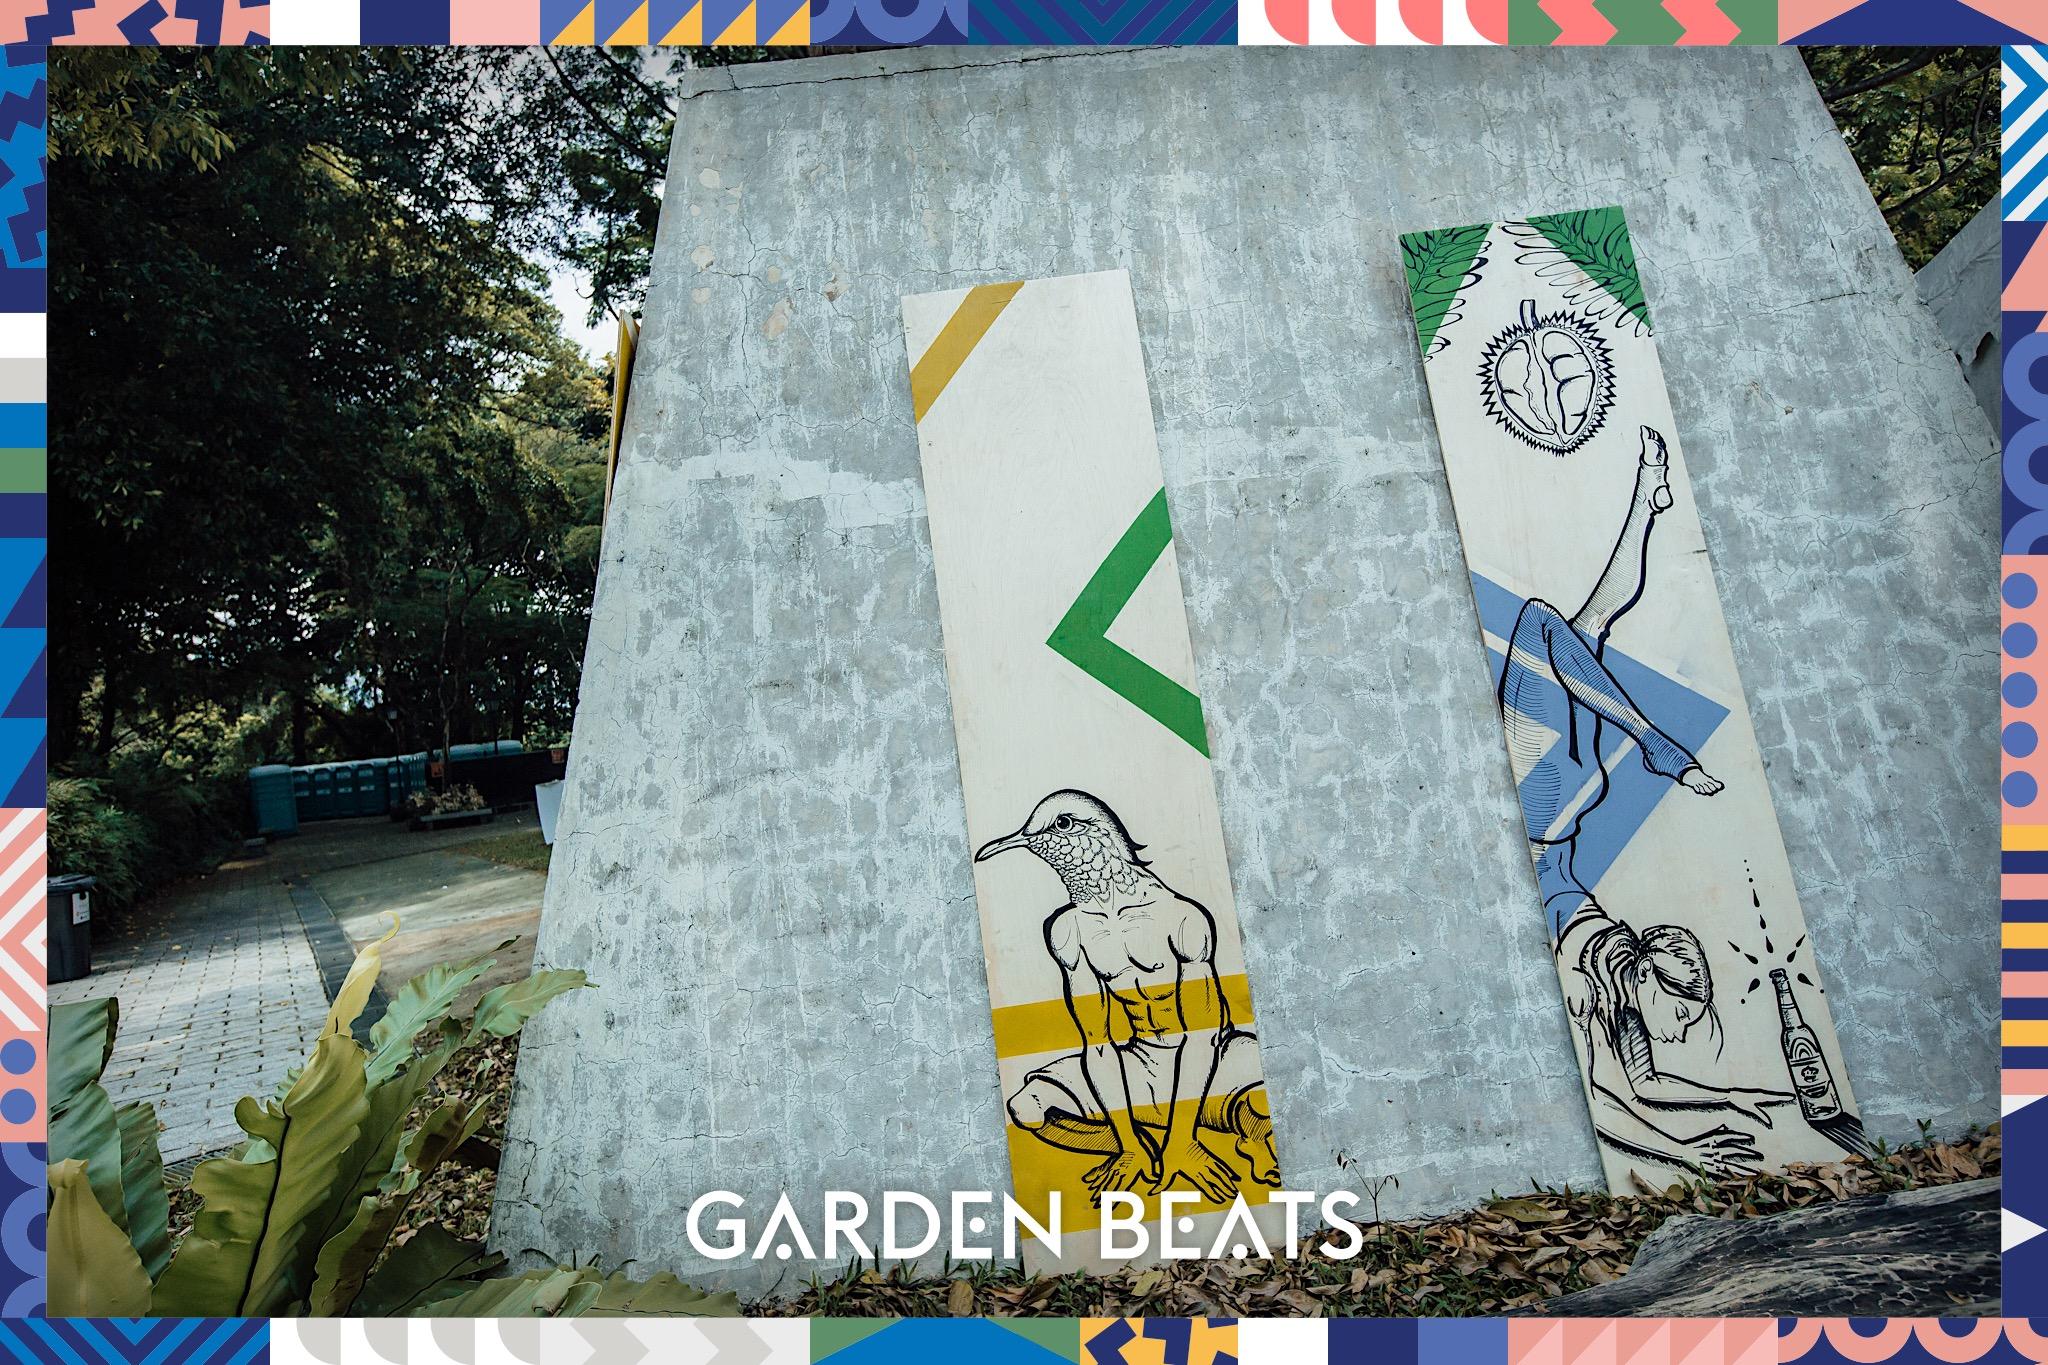 18032017_GardenBeats_Colossal068_WatermarkedGB.jpg